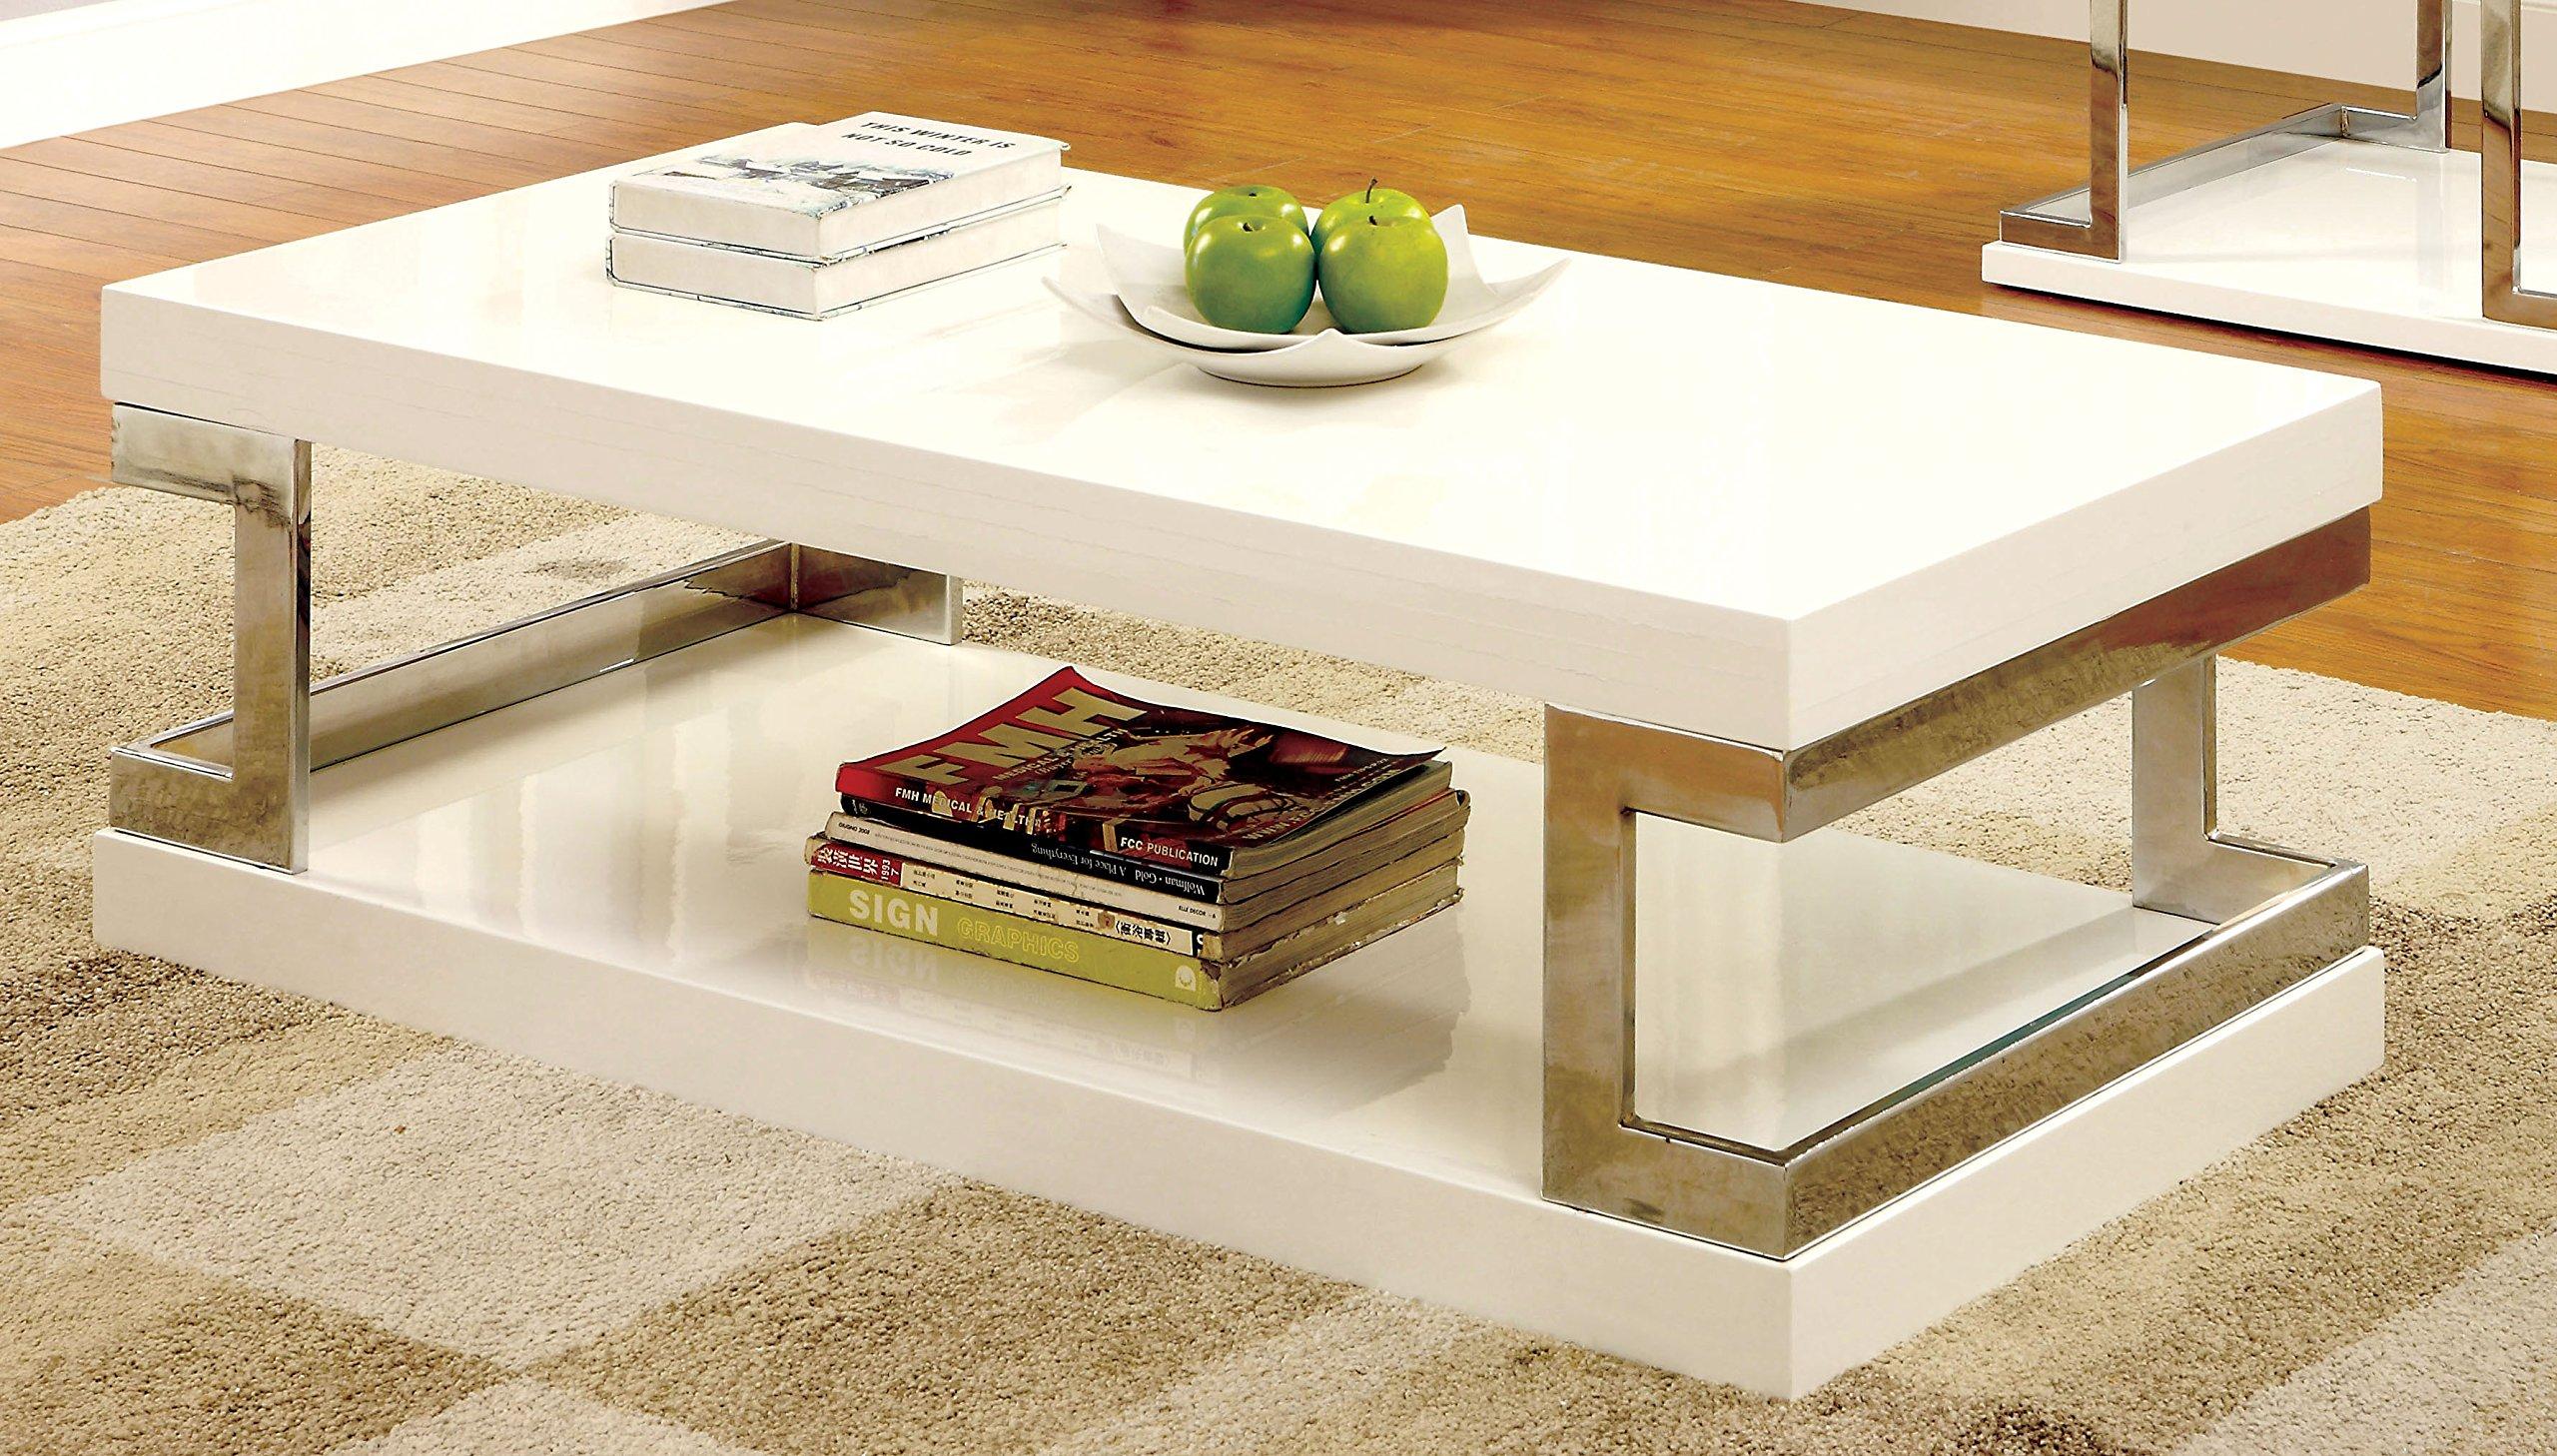 Furniture of America Adina Modern Coffee Table, White by Furniture of America